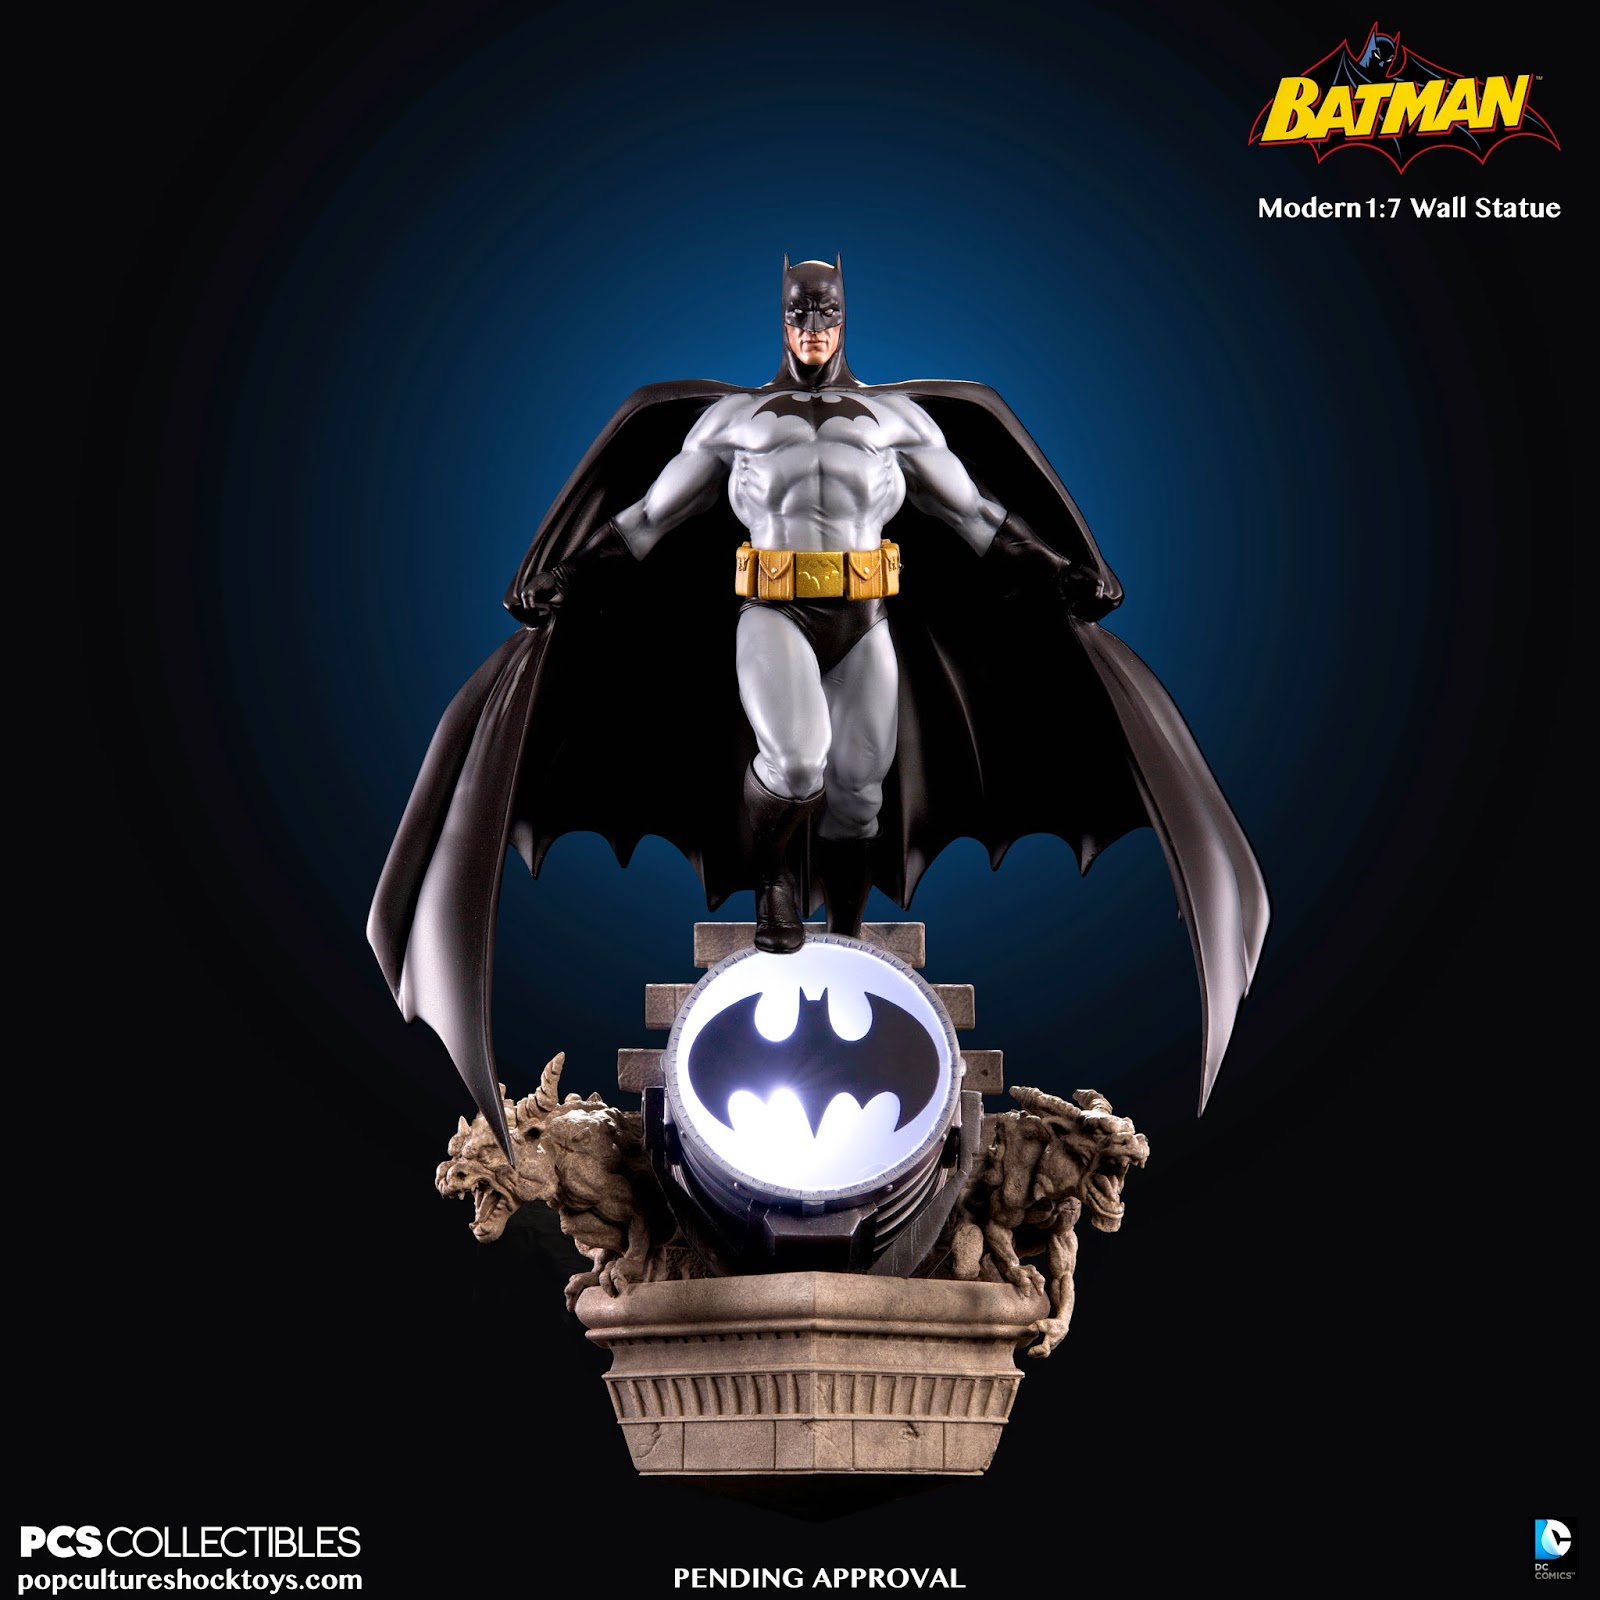 BATMAN MODERN AGE 1:7 WALL STATUE